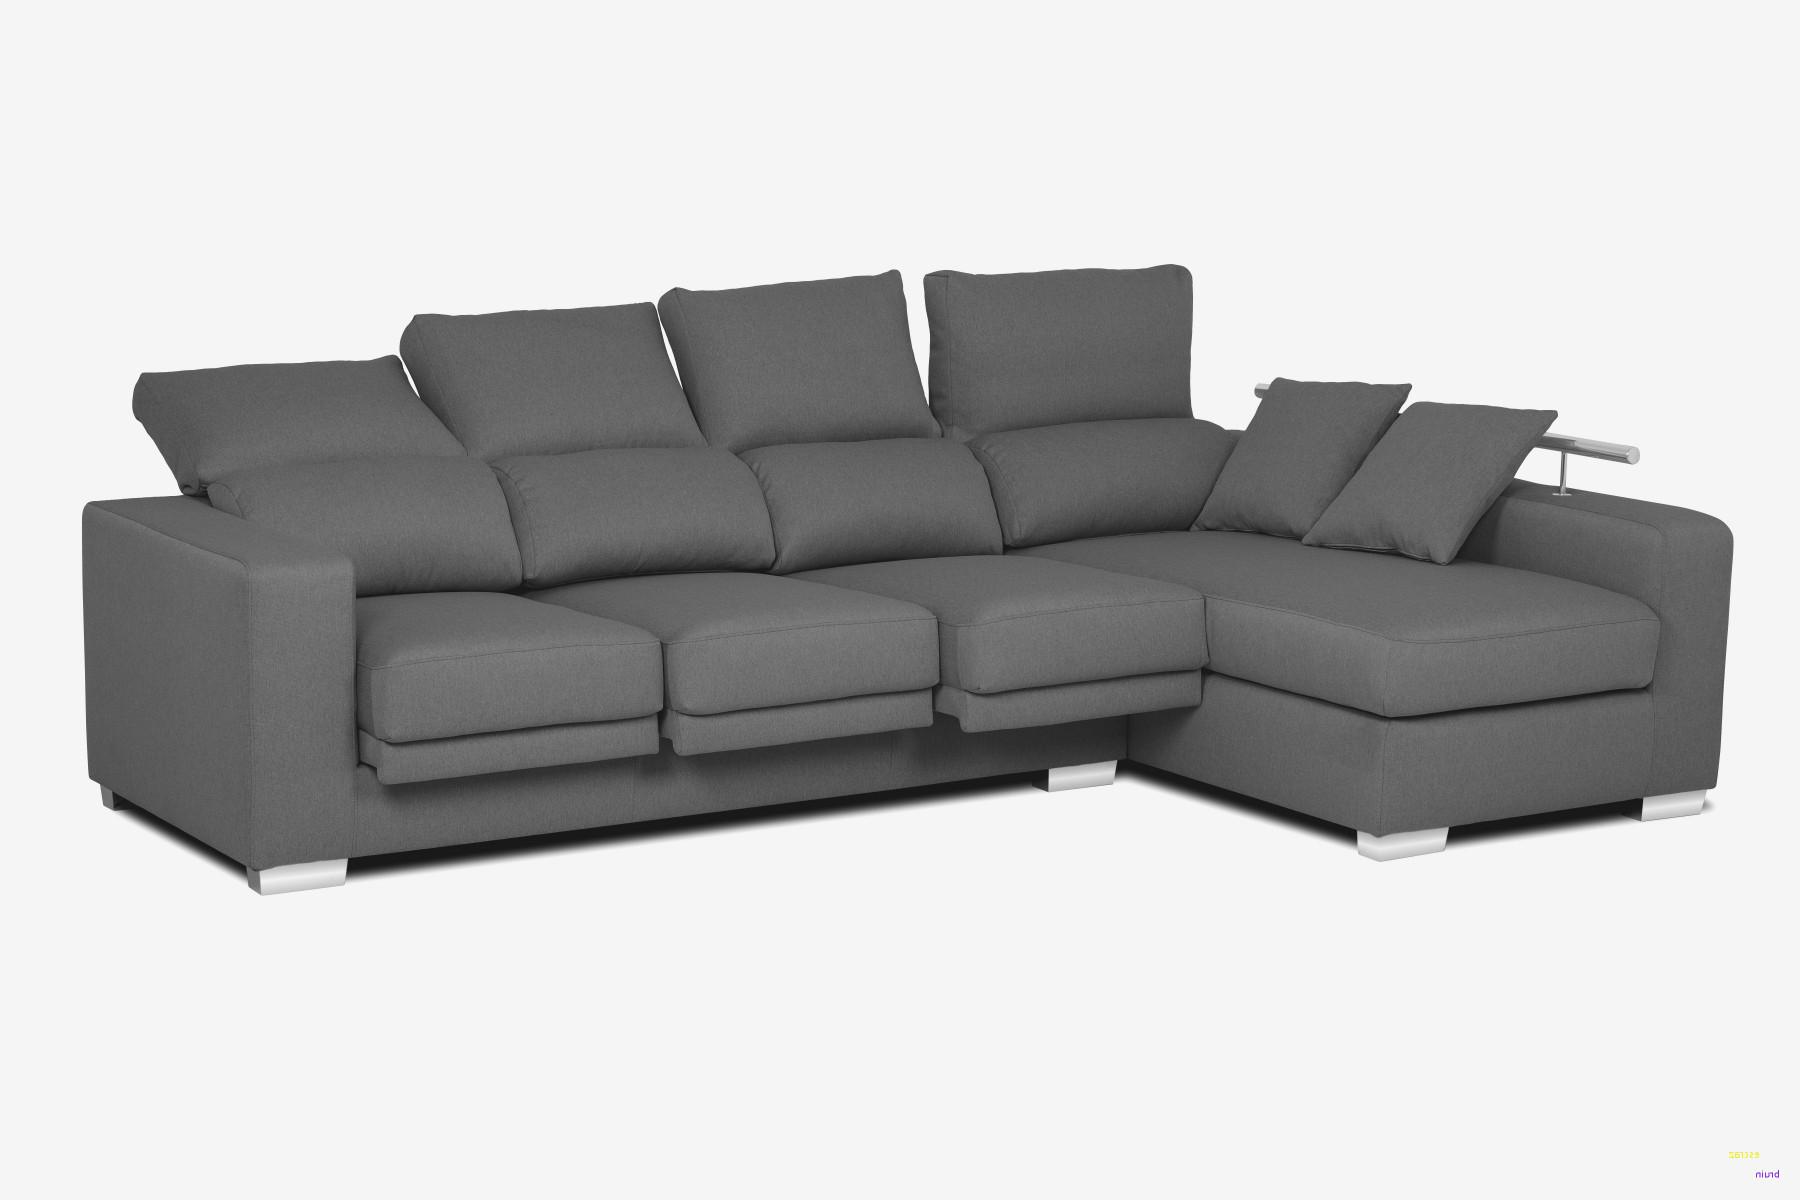 Sillon Relax Conforama Tldn Sillon Relax Conforama Increà Ble Conforama sofa Cama Niza 4k